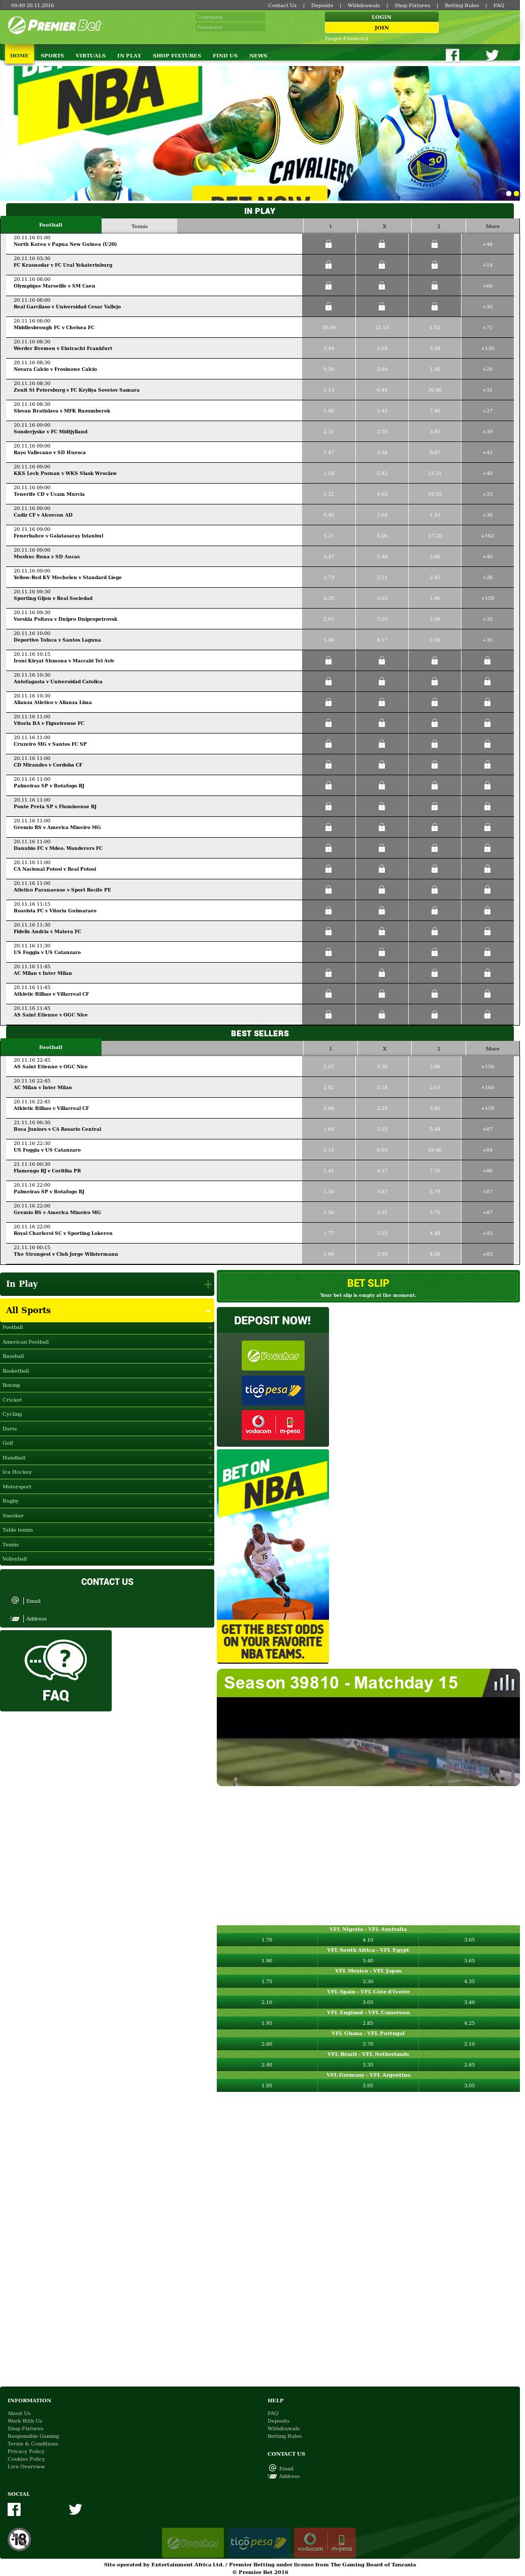 premier betting fixtures megamix 80